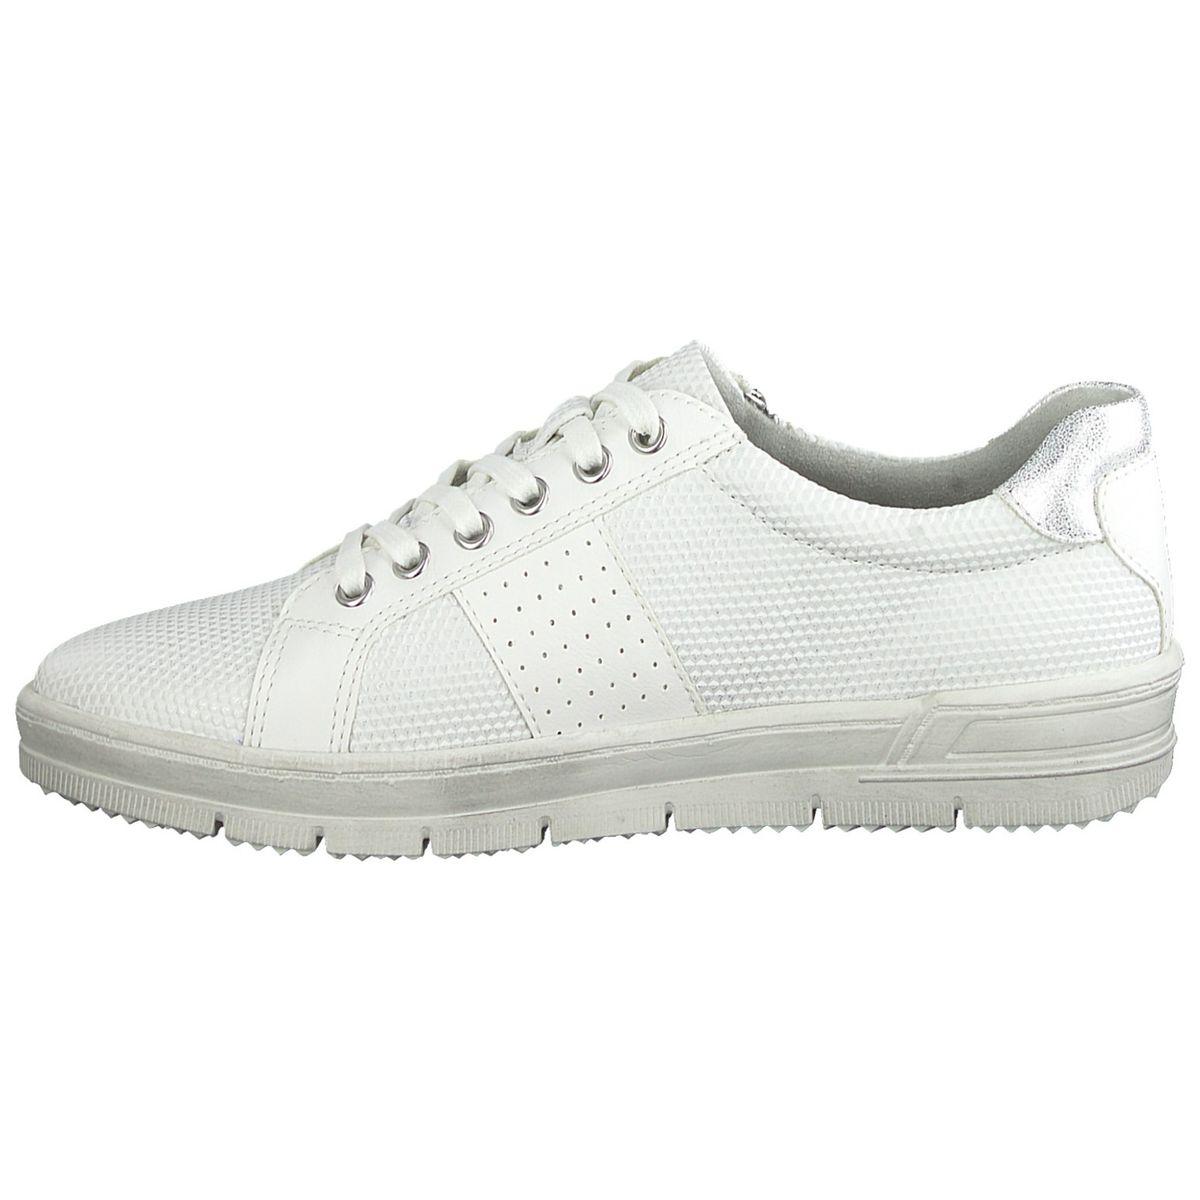 TAMARIS Damen Sneaker Weiß